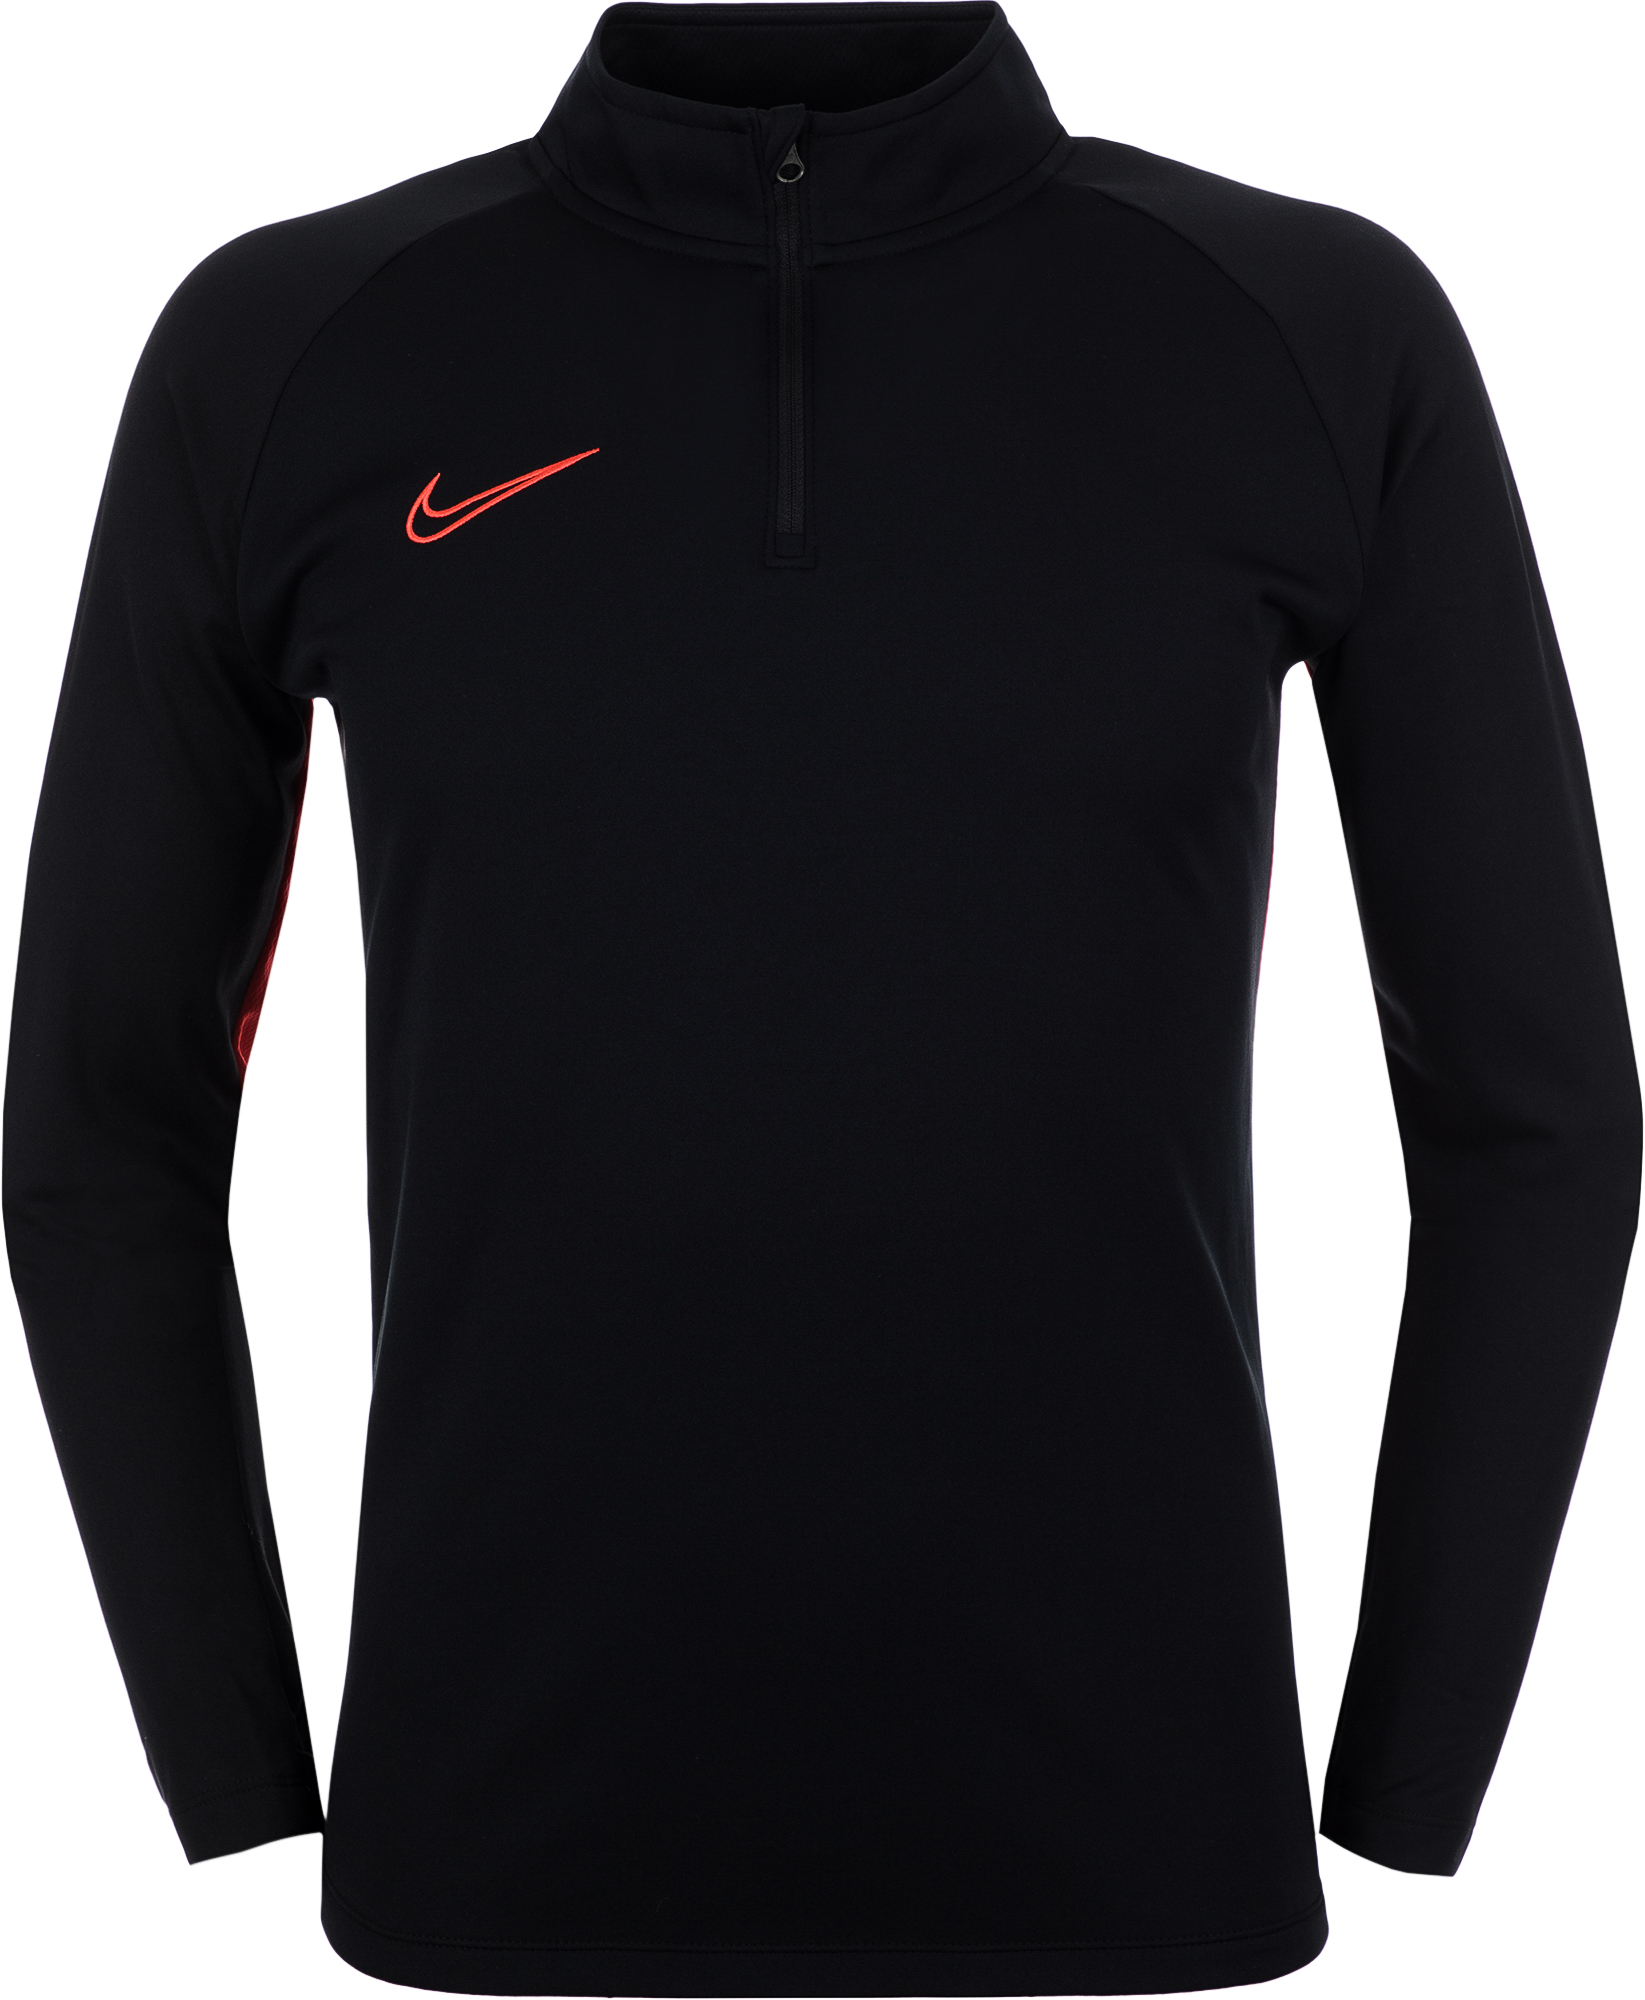 цена Nike Джемпер мужской Nike Academy, размер 52-54 онлайн в 2017 году